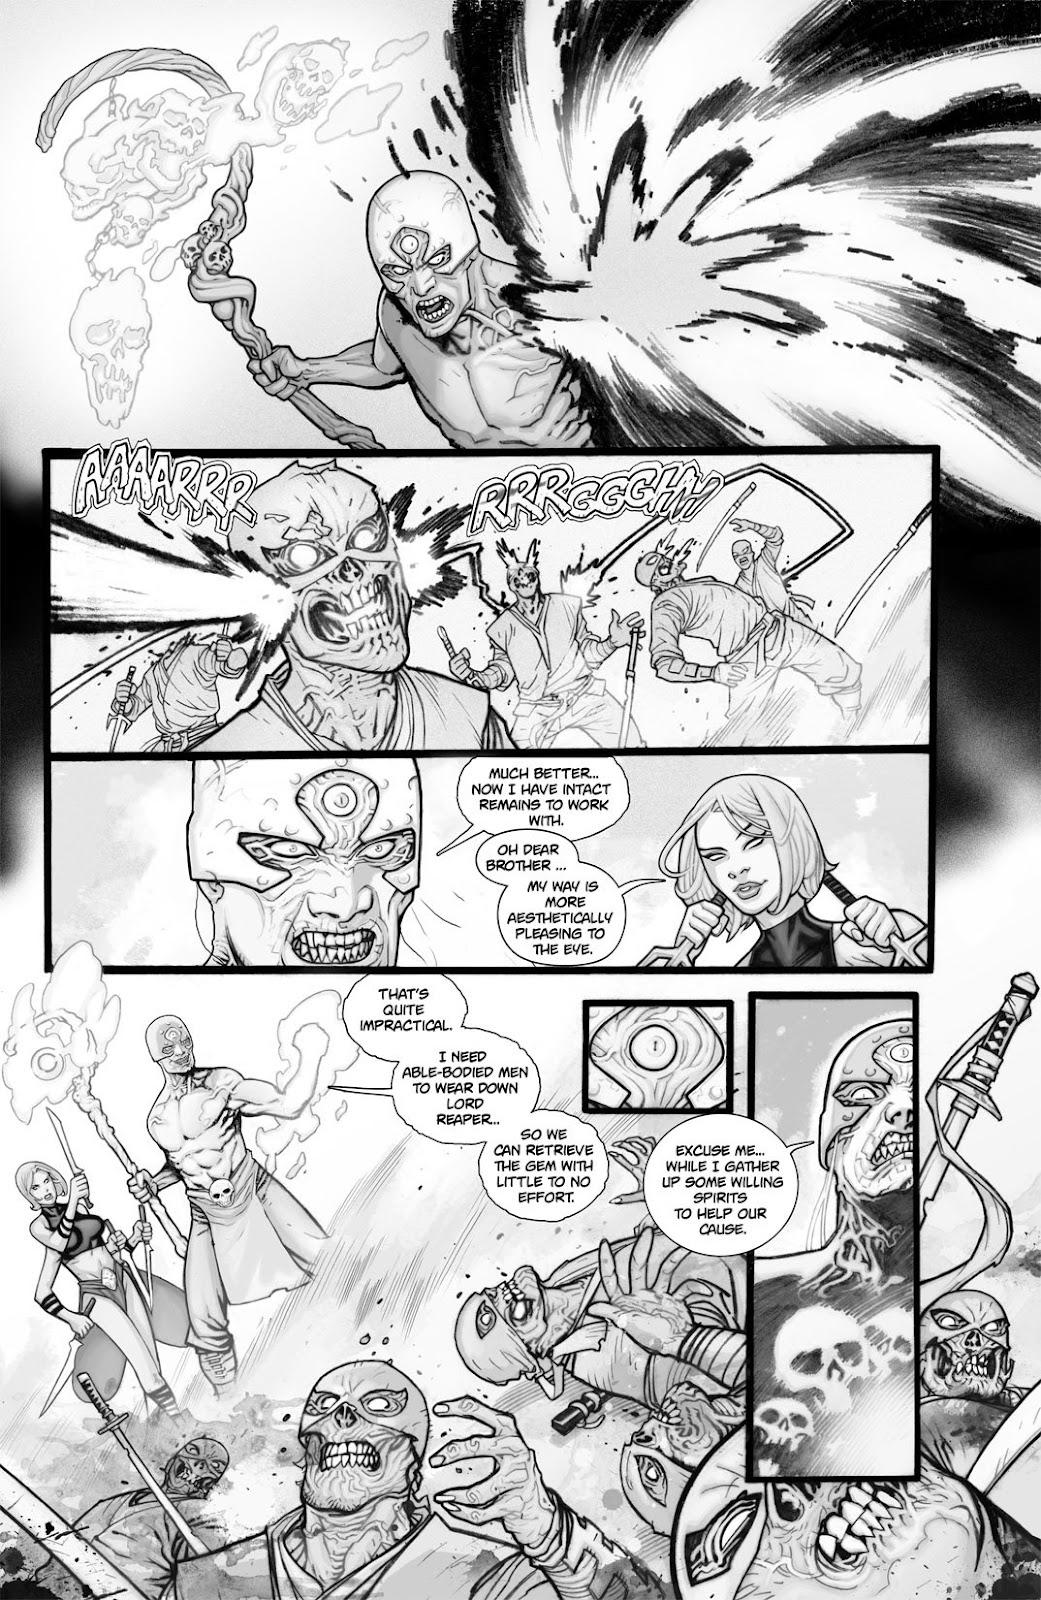 Read online Reaper comic -  Issue #2 - 13